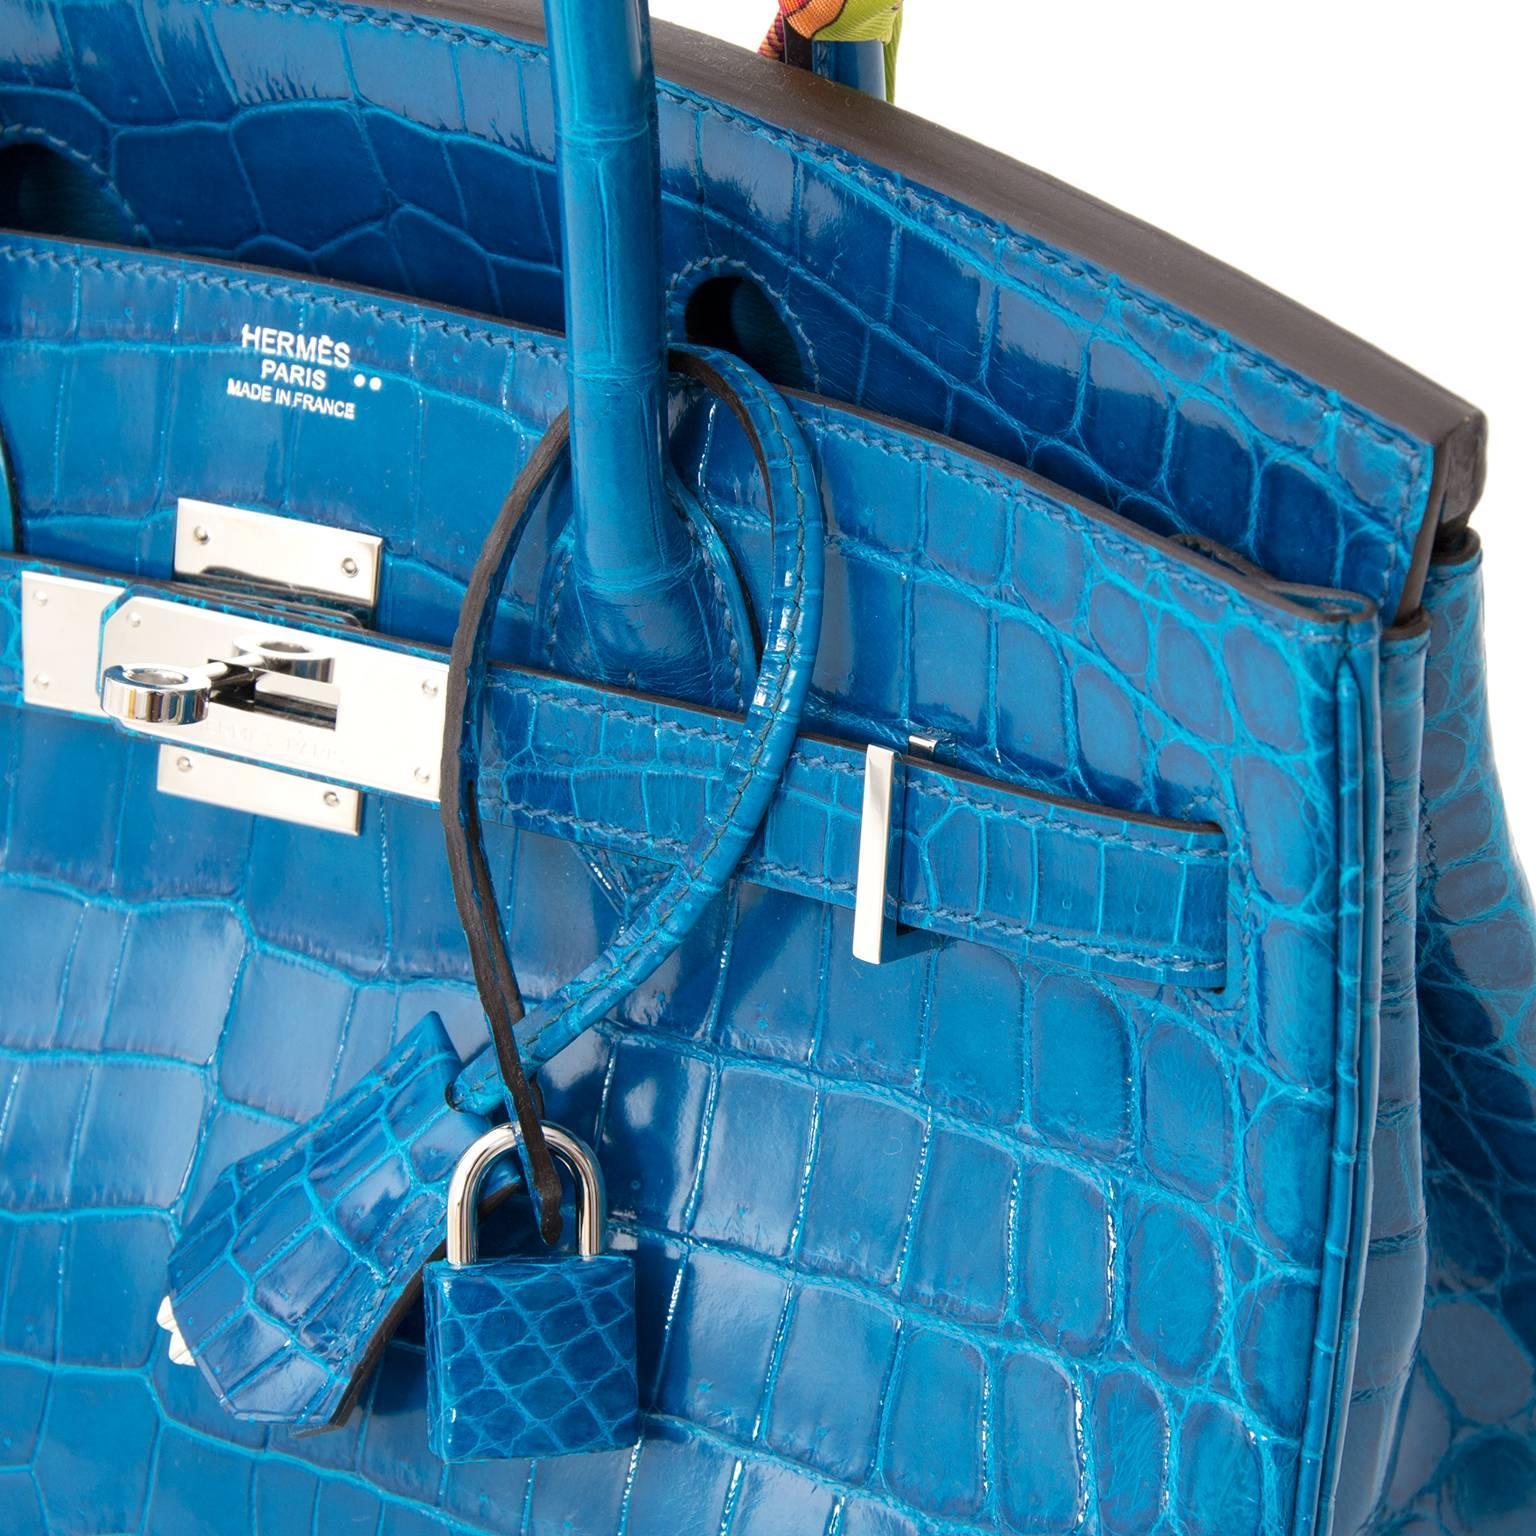 db223551e612 Hermès Birkin 30 Blue Izmir Crocodile Niloticus PHW at 1stdibs